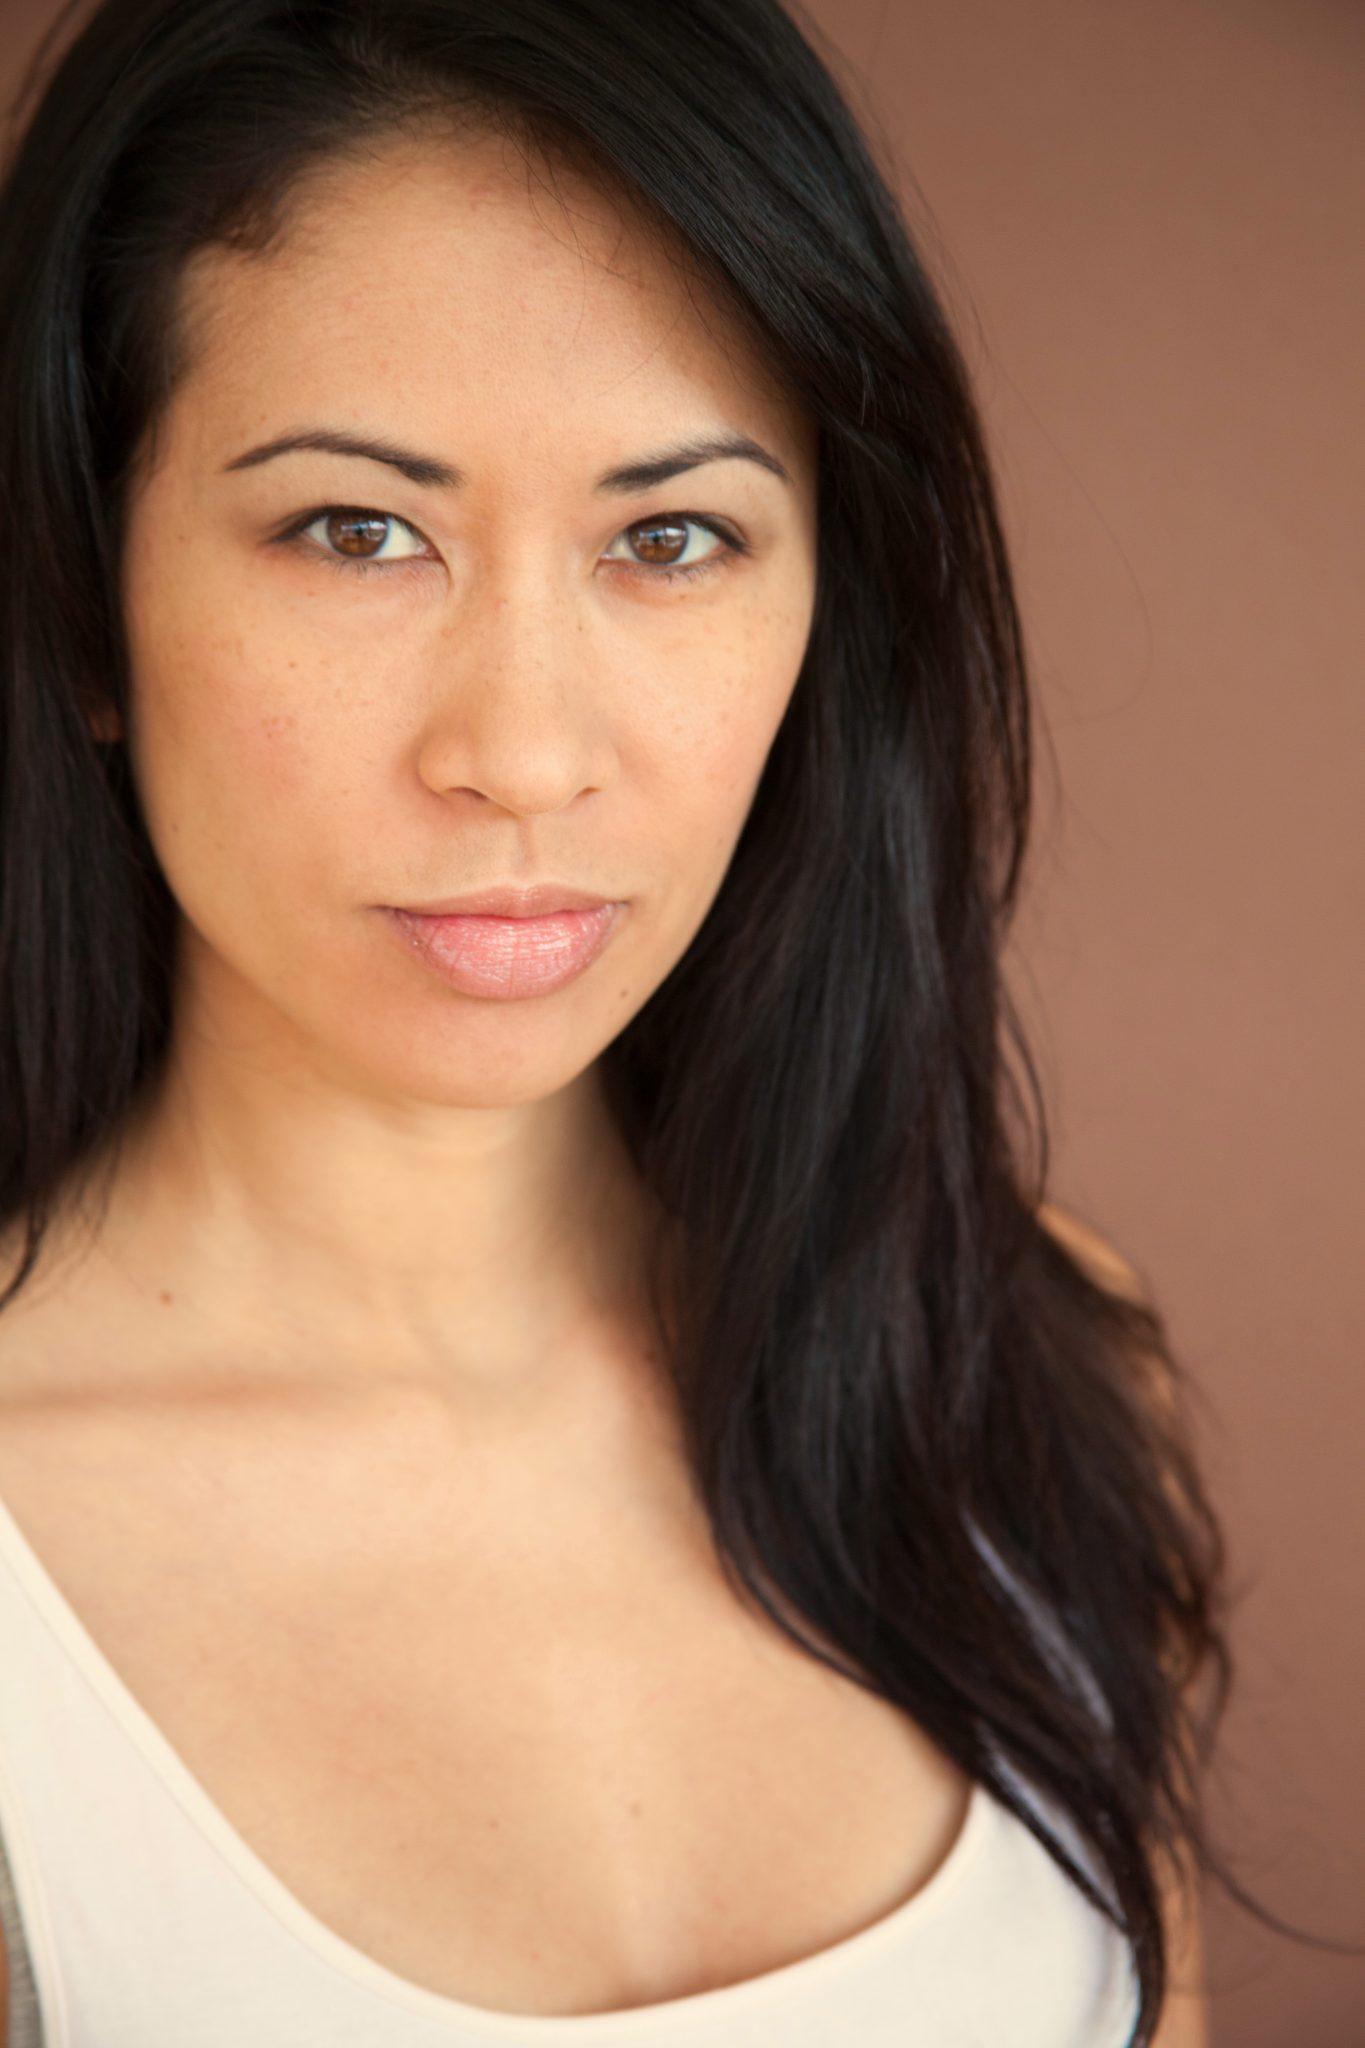 Elaine Lee (actress) Elaine Lee (actress) new images